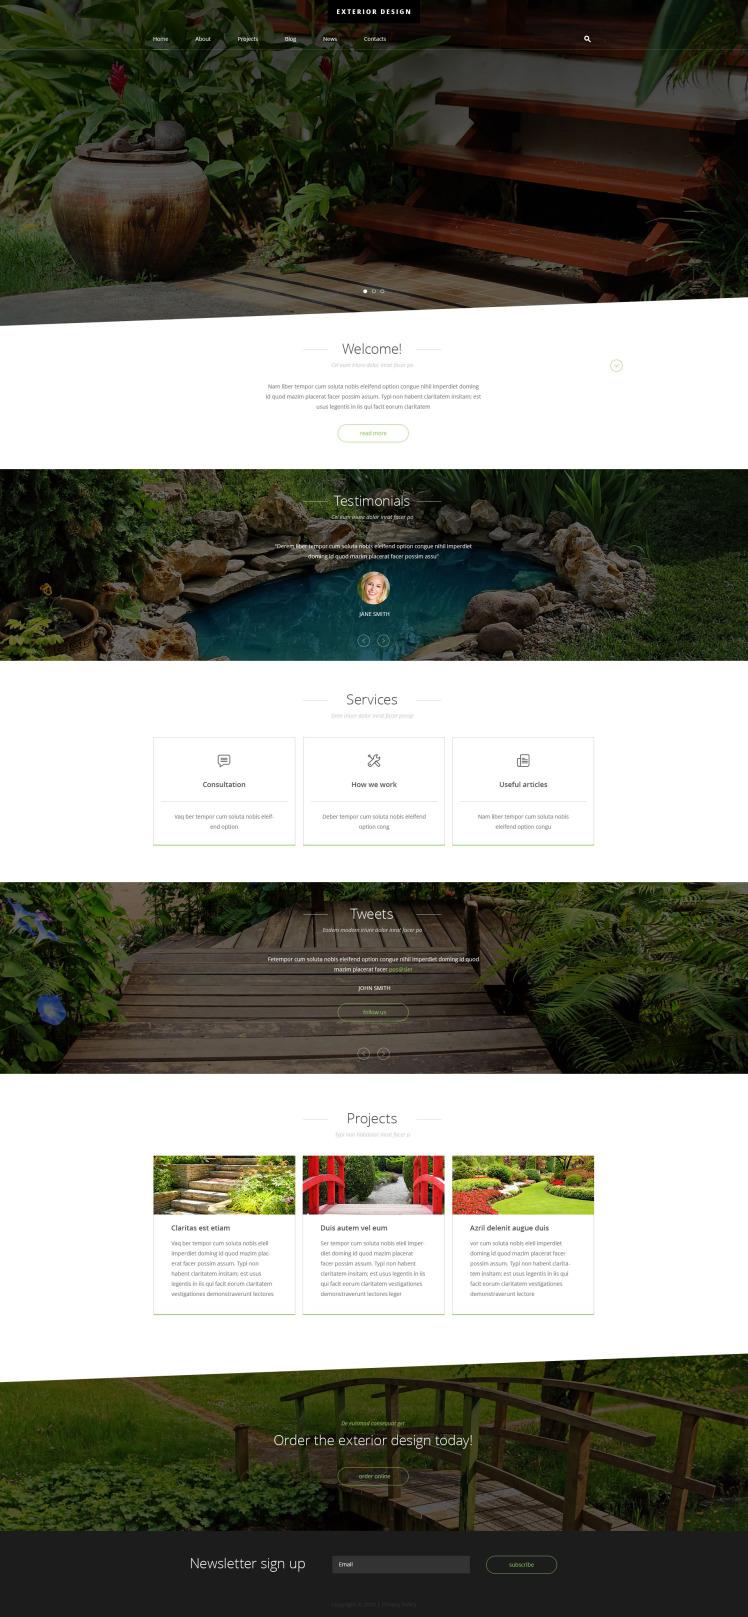 Exterior Design Joomla Templates